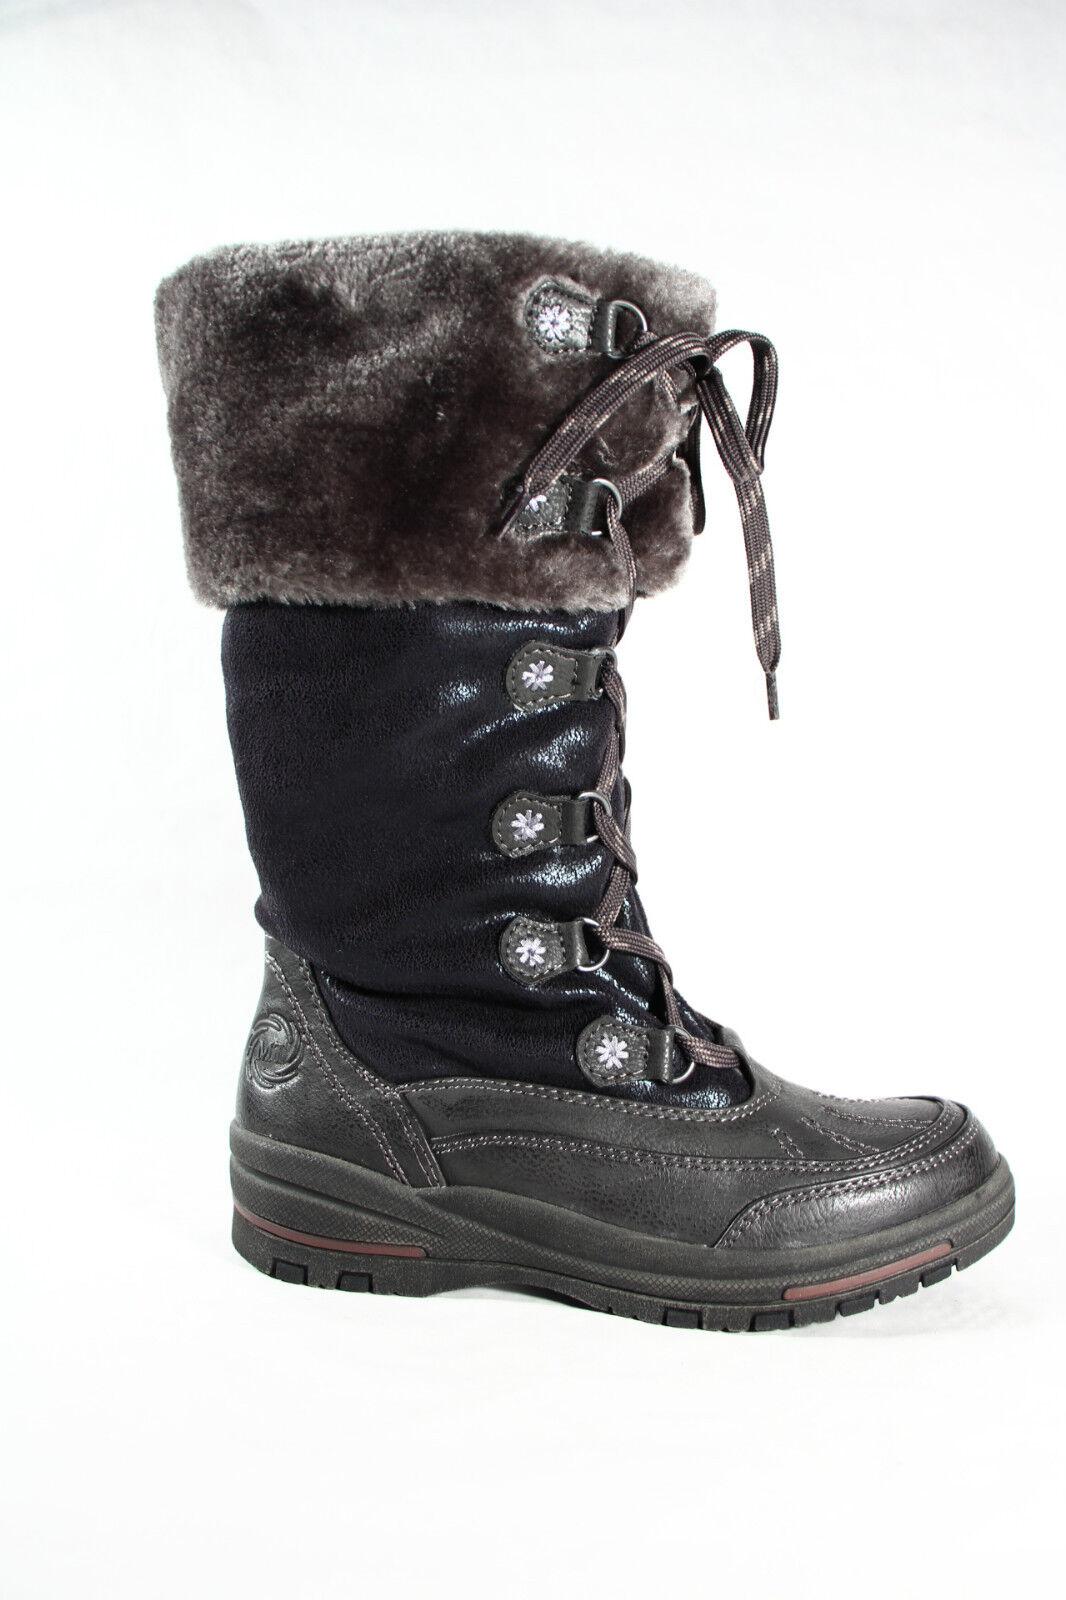 low priced be4e7 f78fc Marco Tozzi Damen Stiefel Stiefeletten Winterstiefel Boots schwarz NEU!!